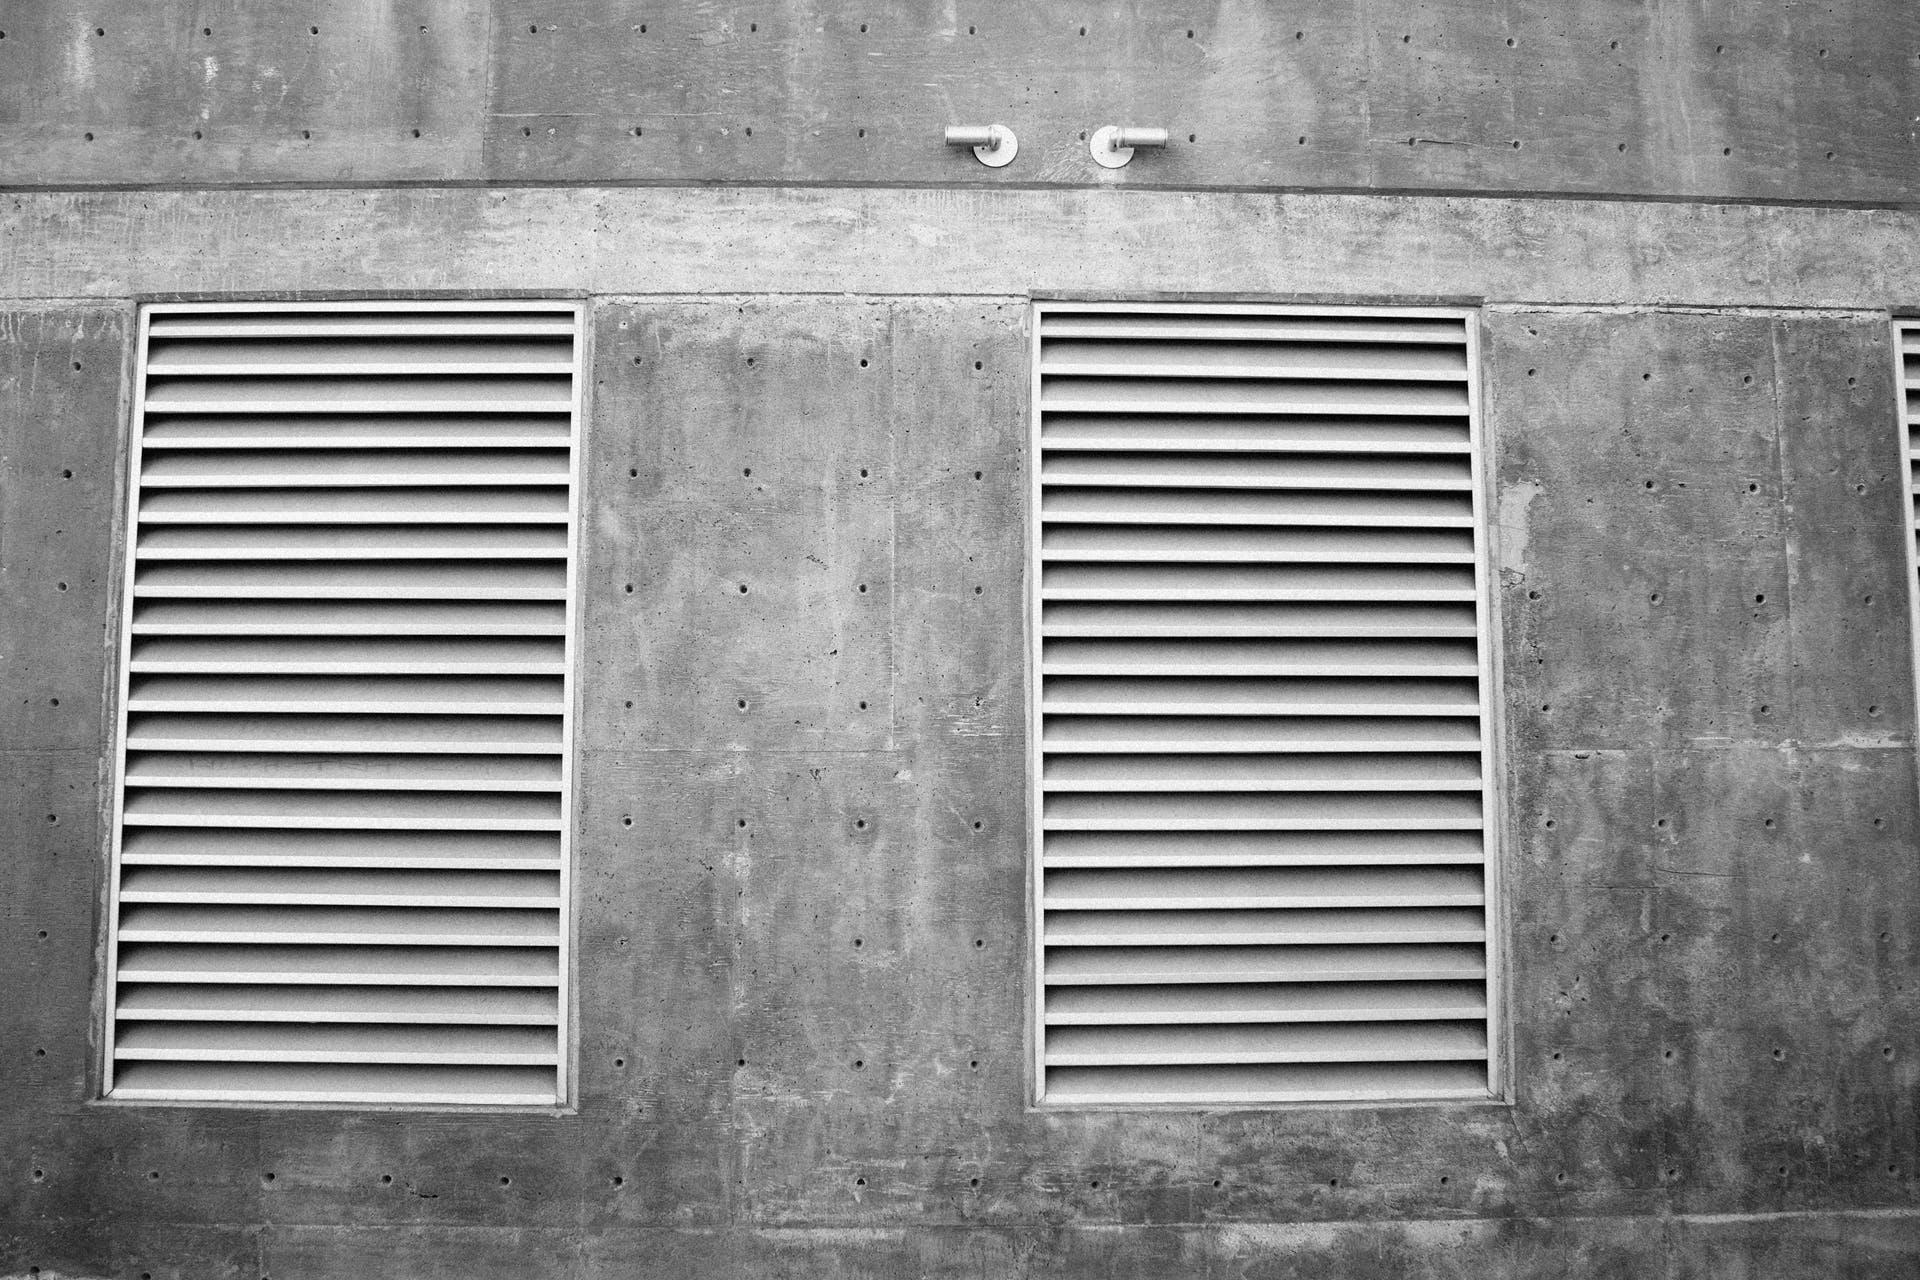 Free stock photo of ventilation shaft, ventilator